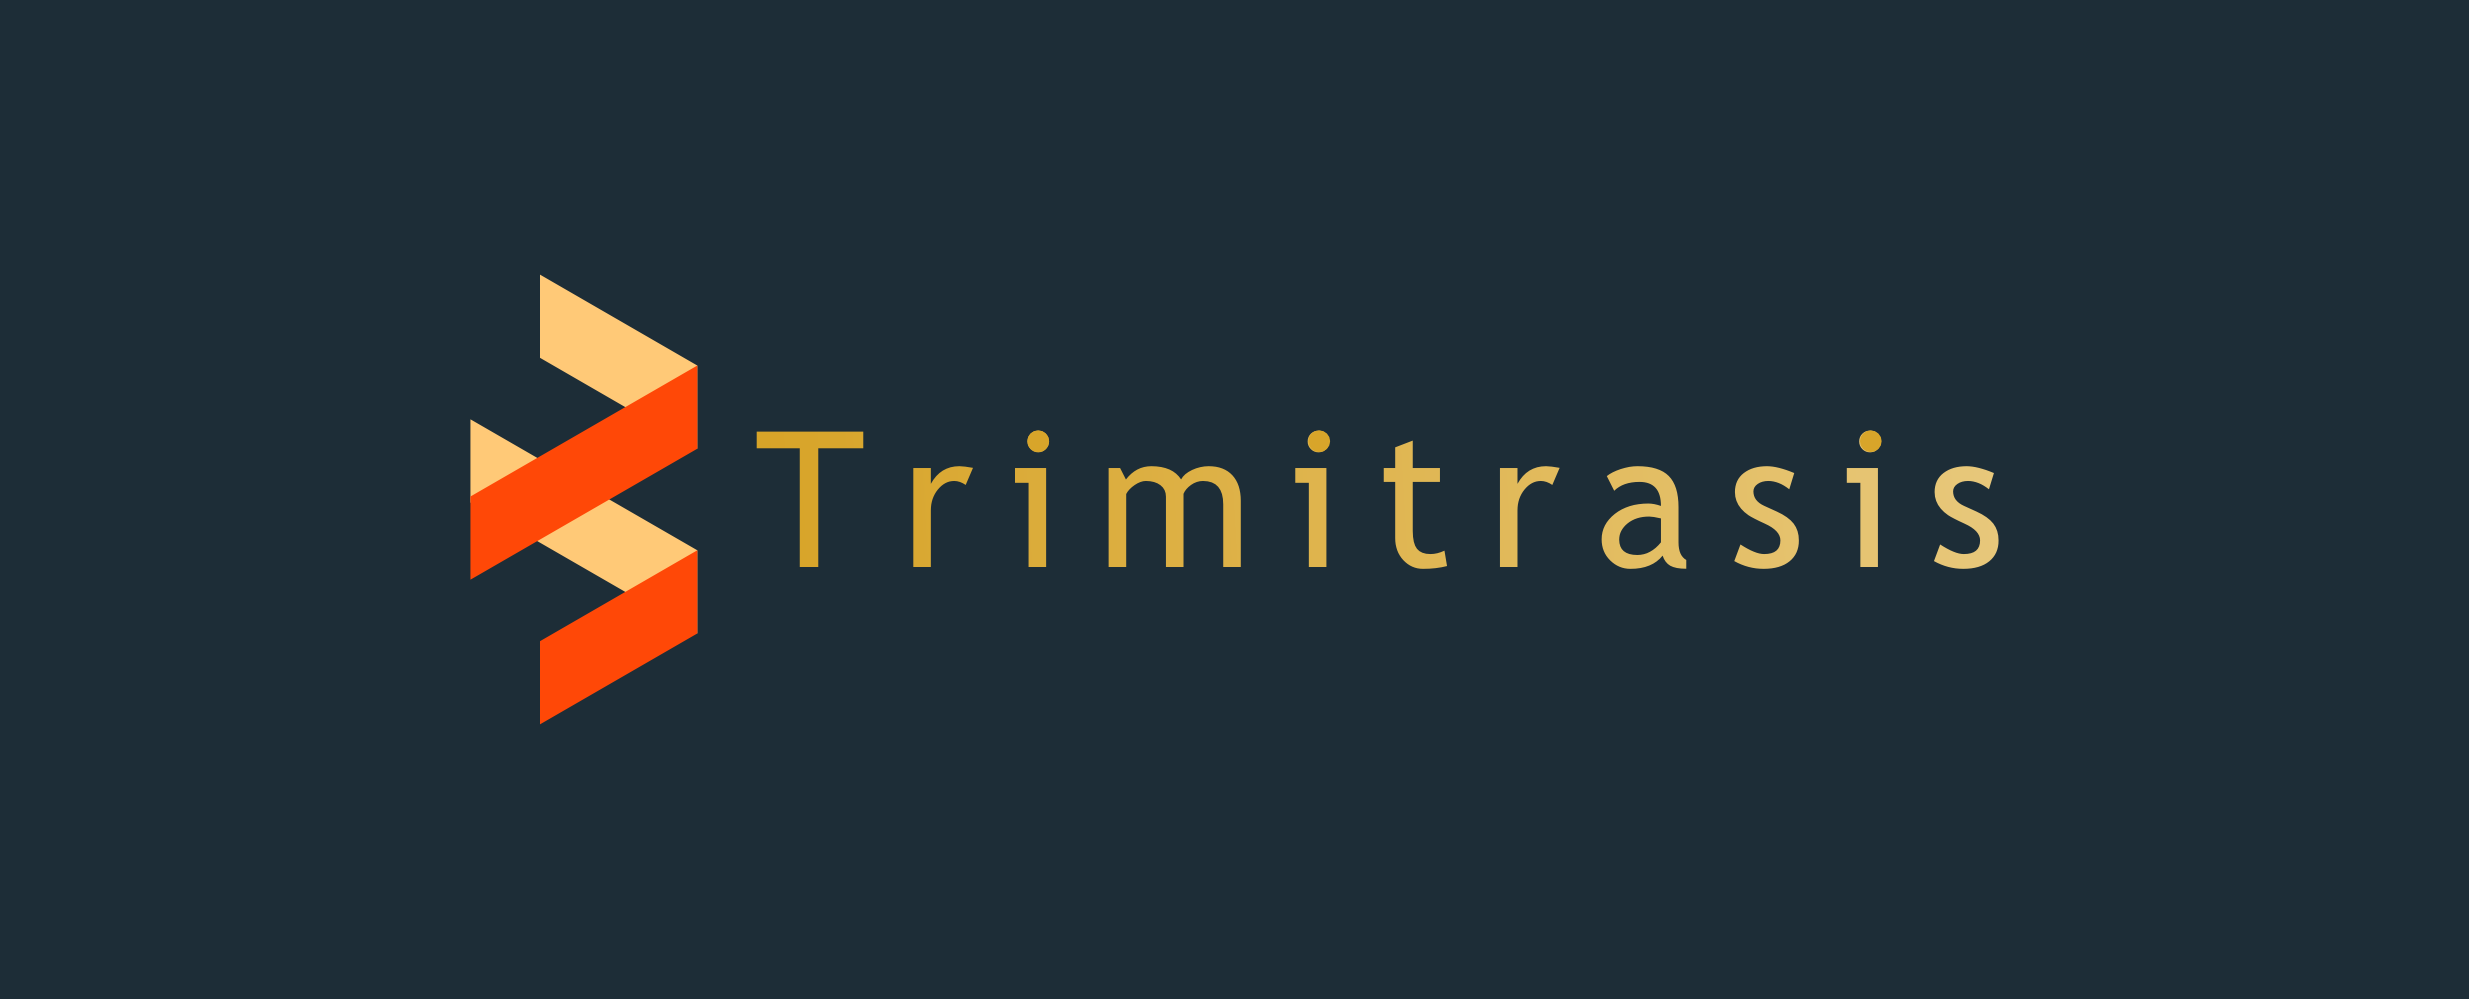 Trimitrasis Consulting